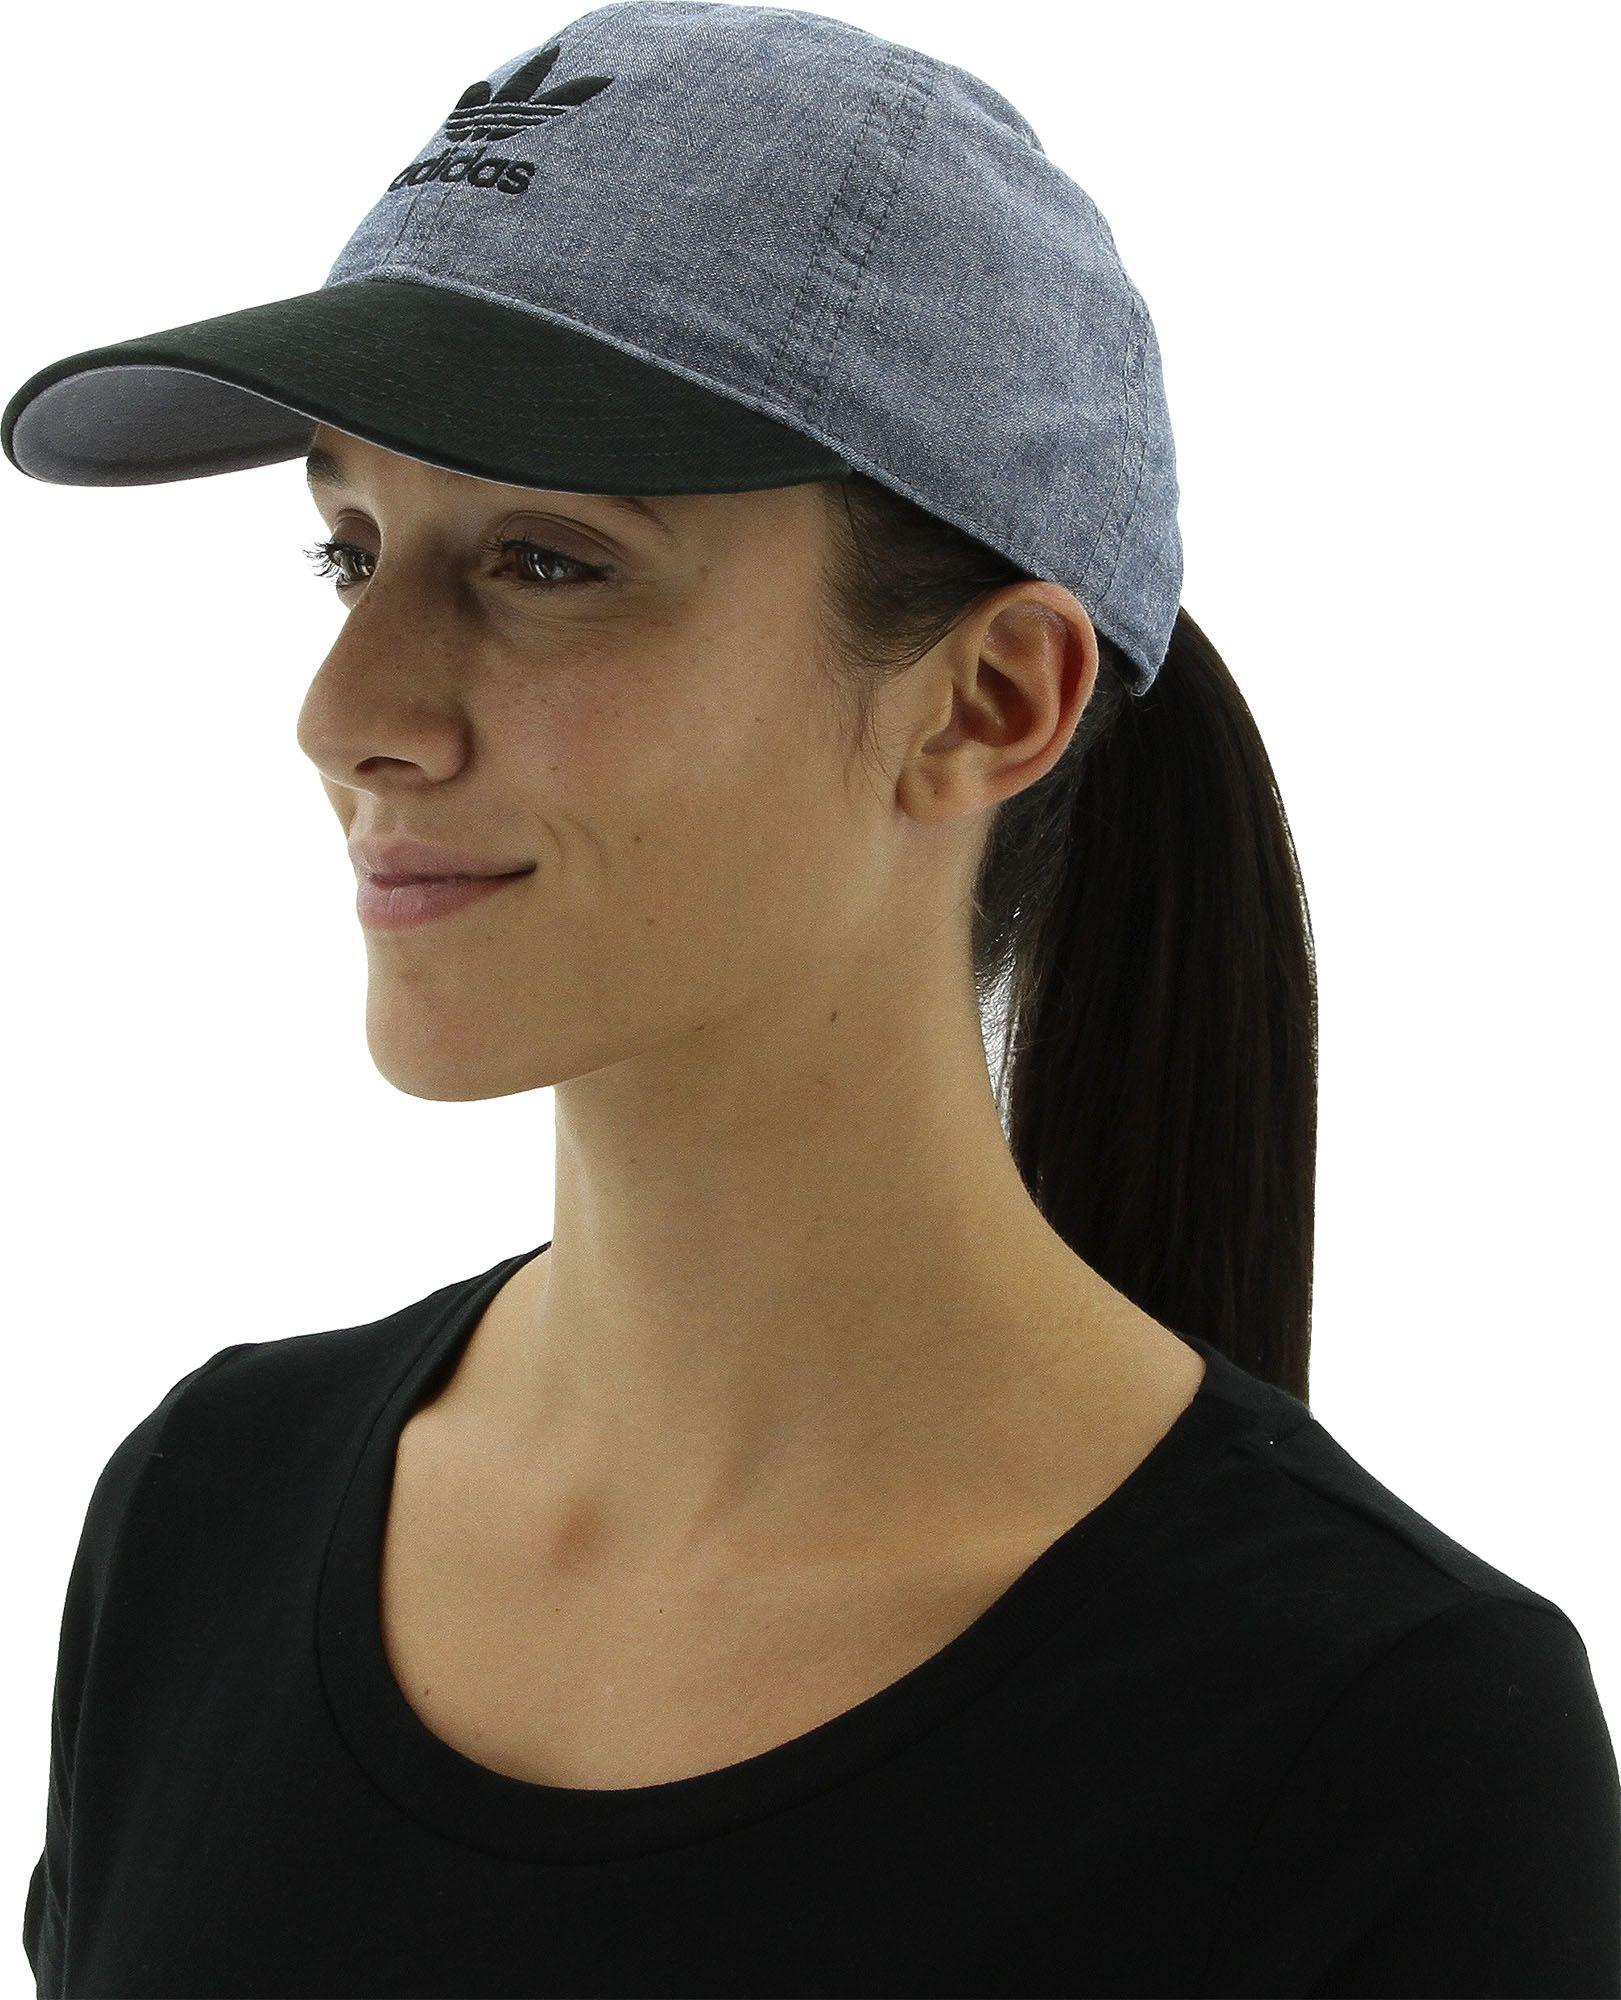 Lyst - adidas Originals Relaxed Strapback Hat 07614ab356c